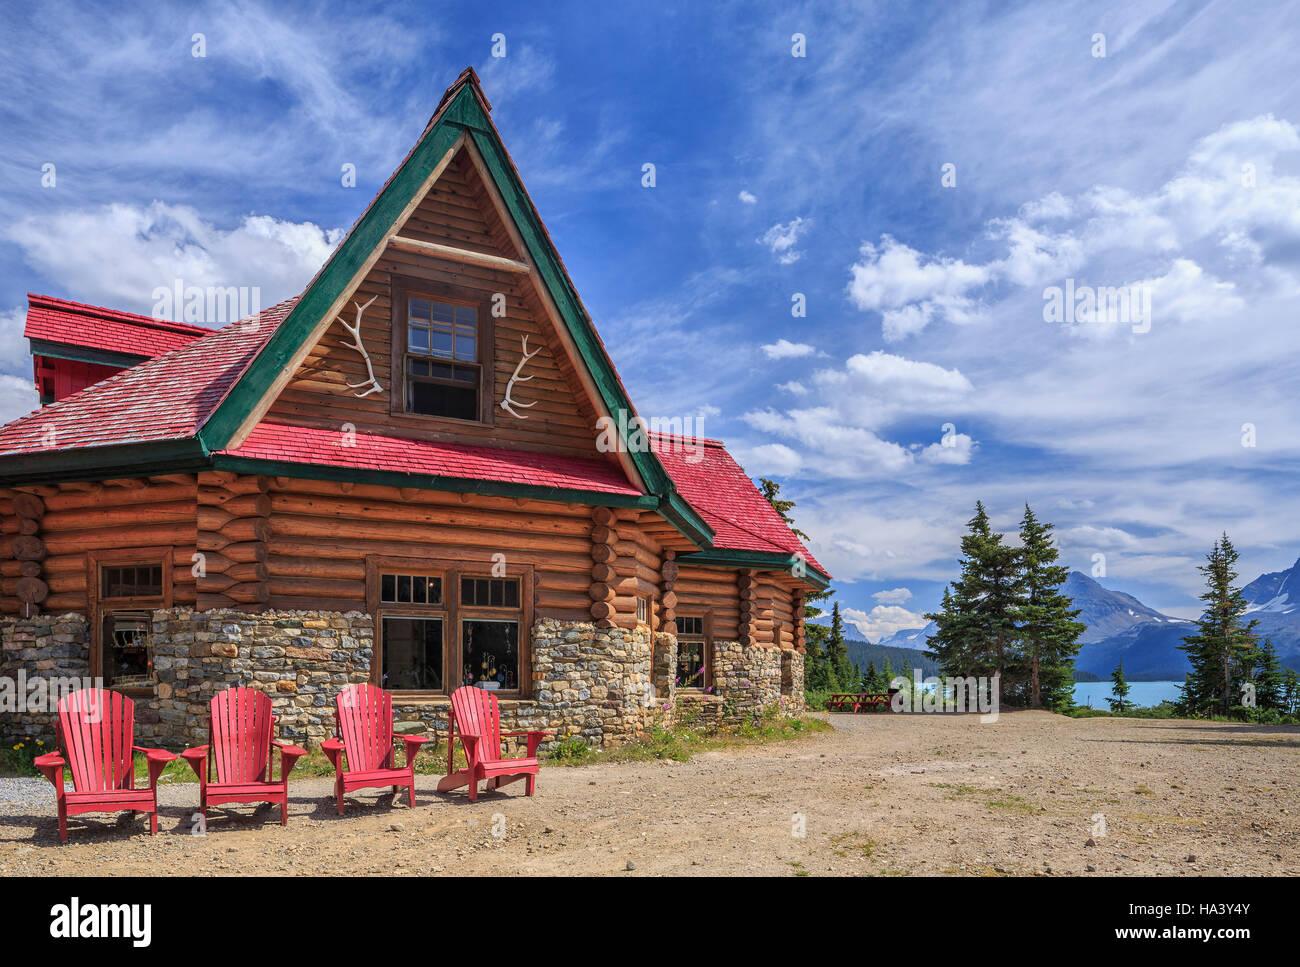 Num-Ti-Jah Lodge, Banff National Park, Alberta, Canada. - Stock Image